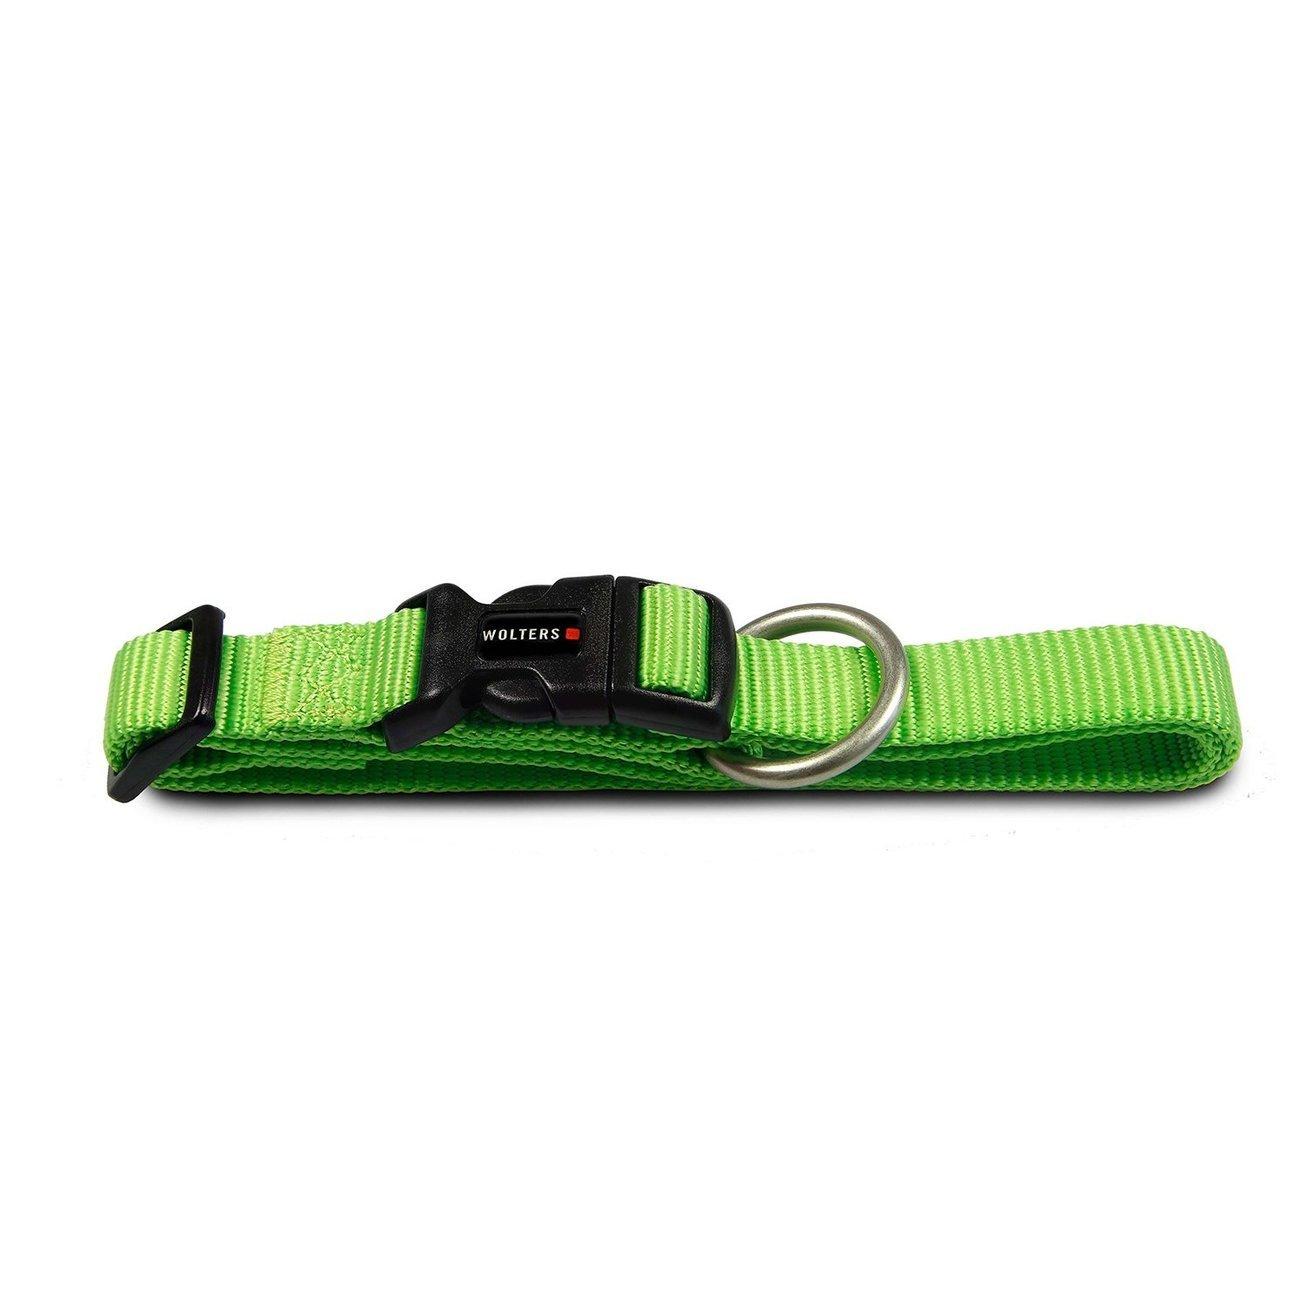 Wolters Halsband Nylon Professional, Bild 7